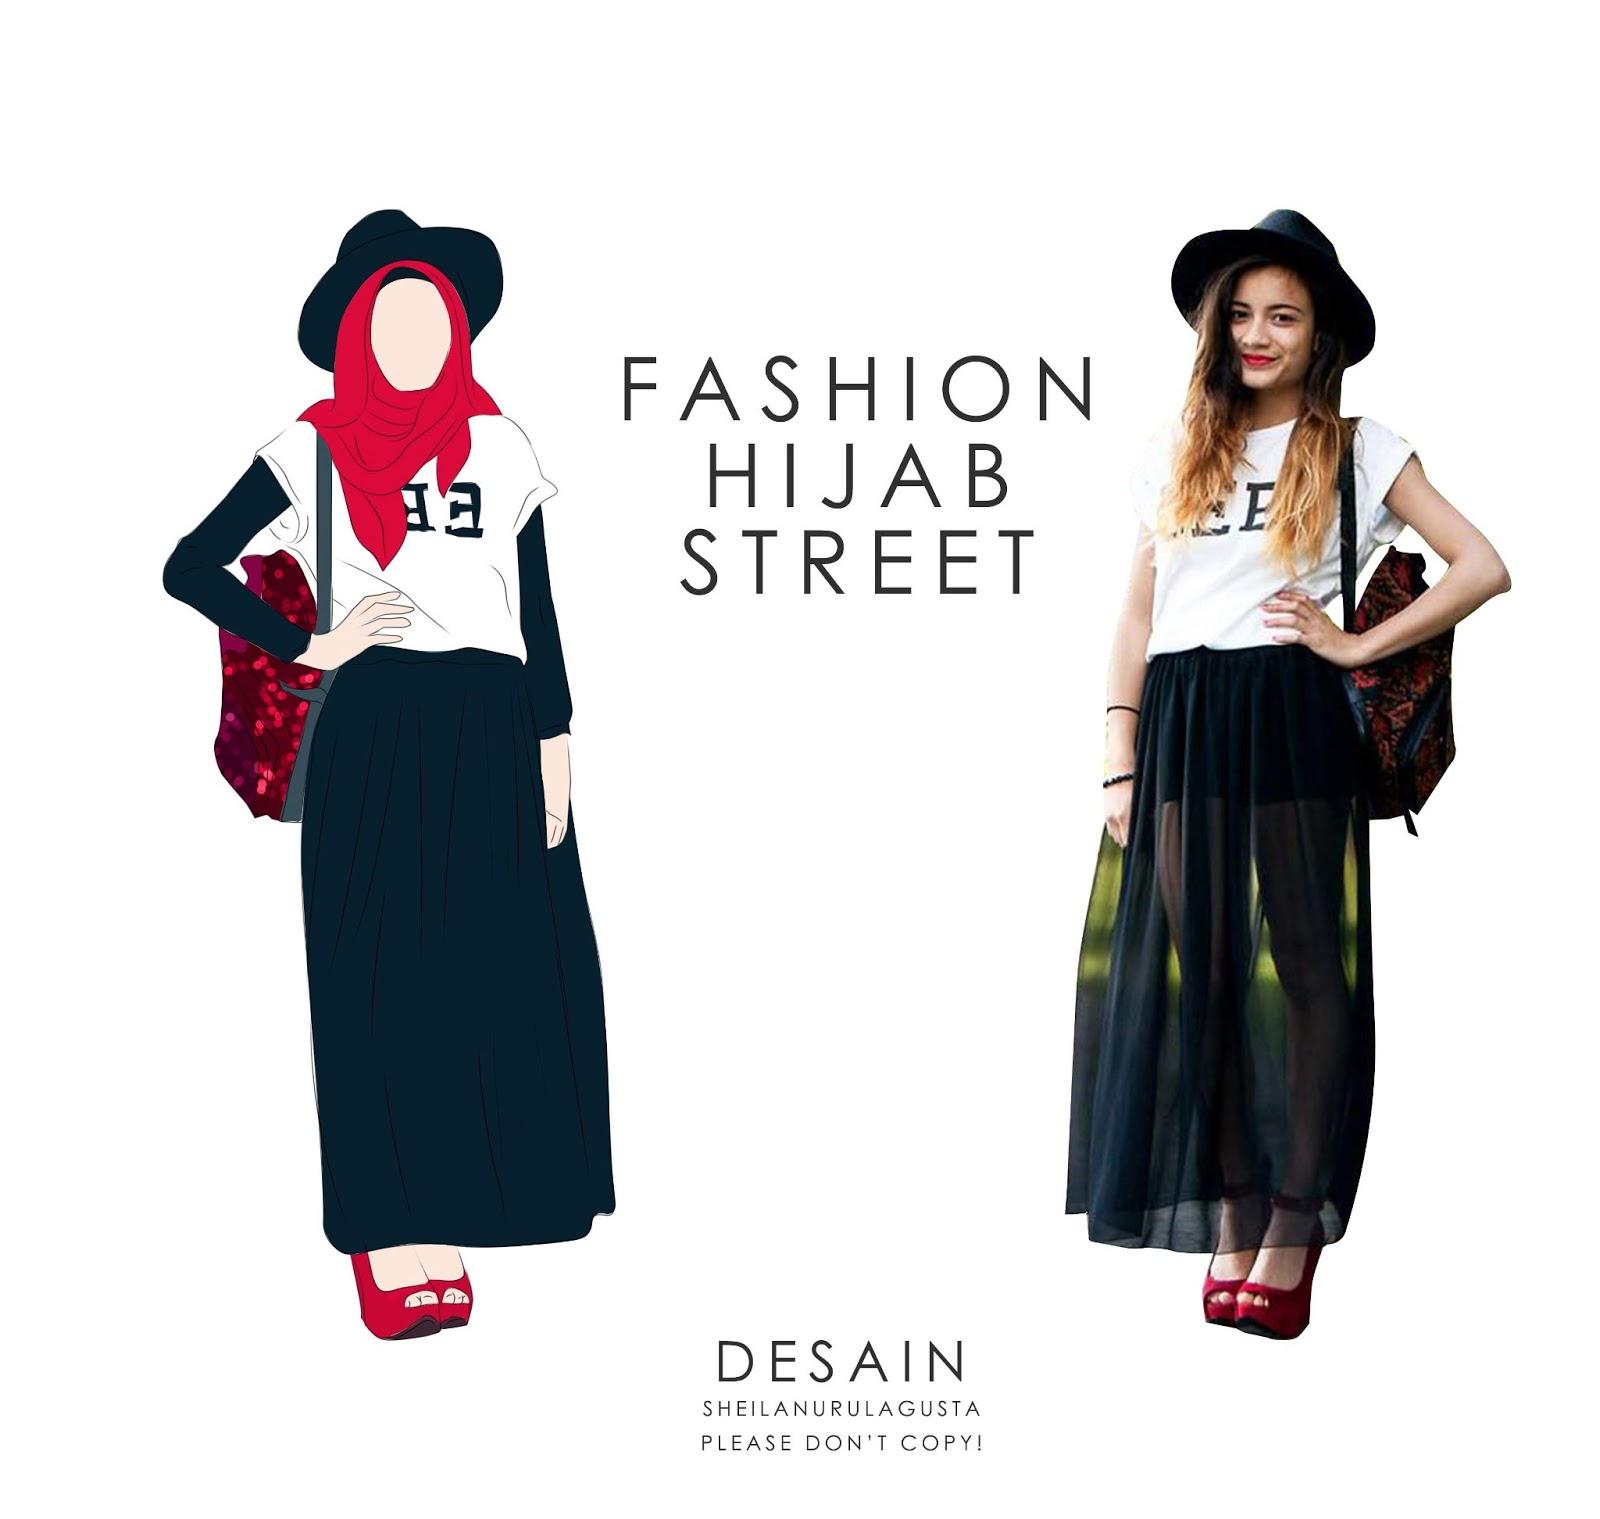 Sheiladesain fashion hijab street Hijab fashion style dailymotion